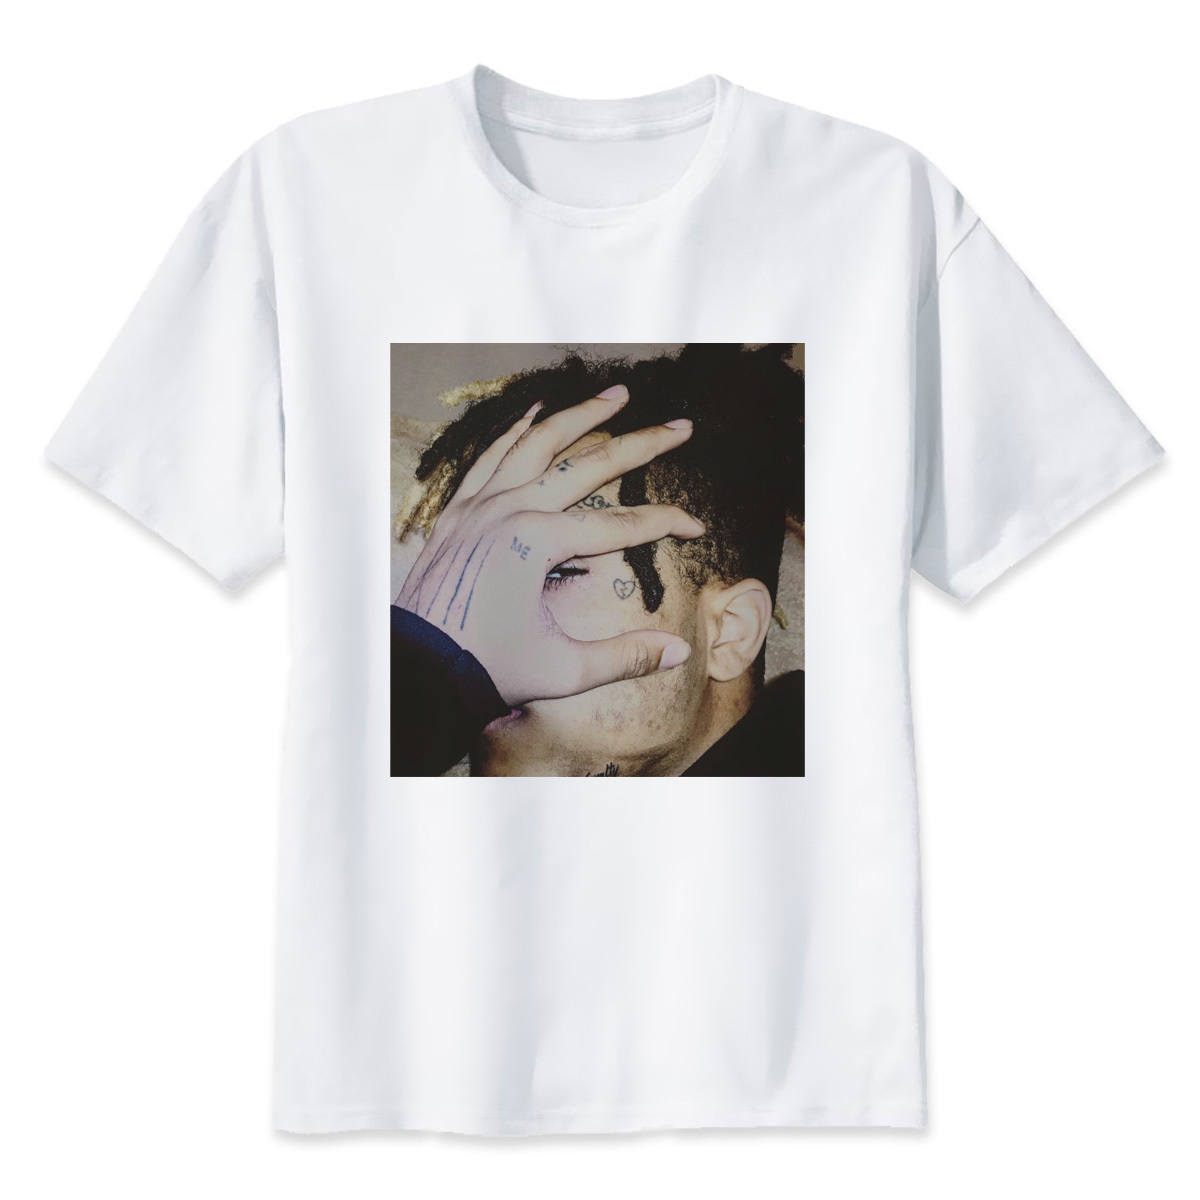 2018  Cool Boy XXXtentacion Printed T-Shirt For Men Novelty Men's Round Neck Short Sleeve T Shirt Tops Fashion Tees Men